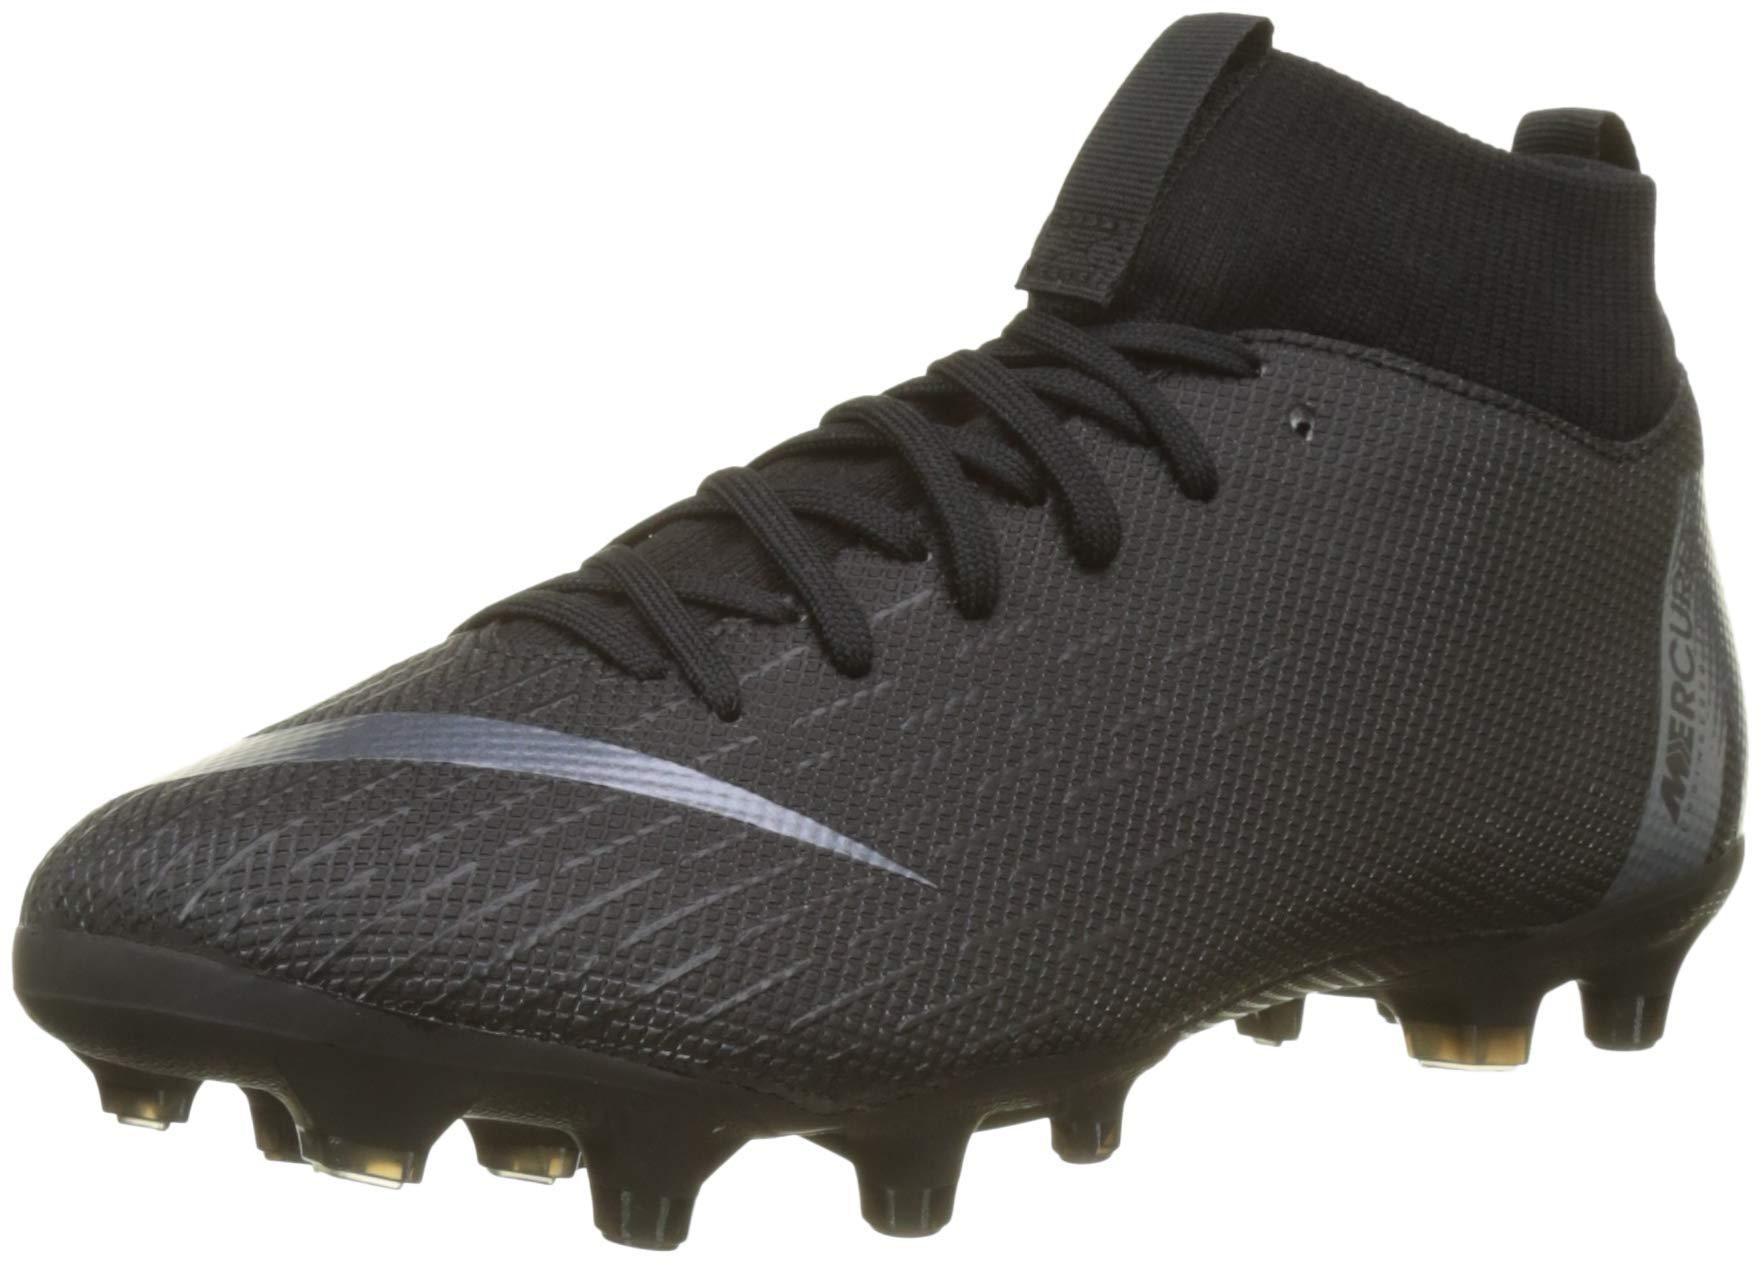 Nike Superfly VI Academy Kid's Soccer Multi Ground Cleats (1 Little Kid M US) Black